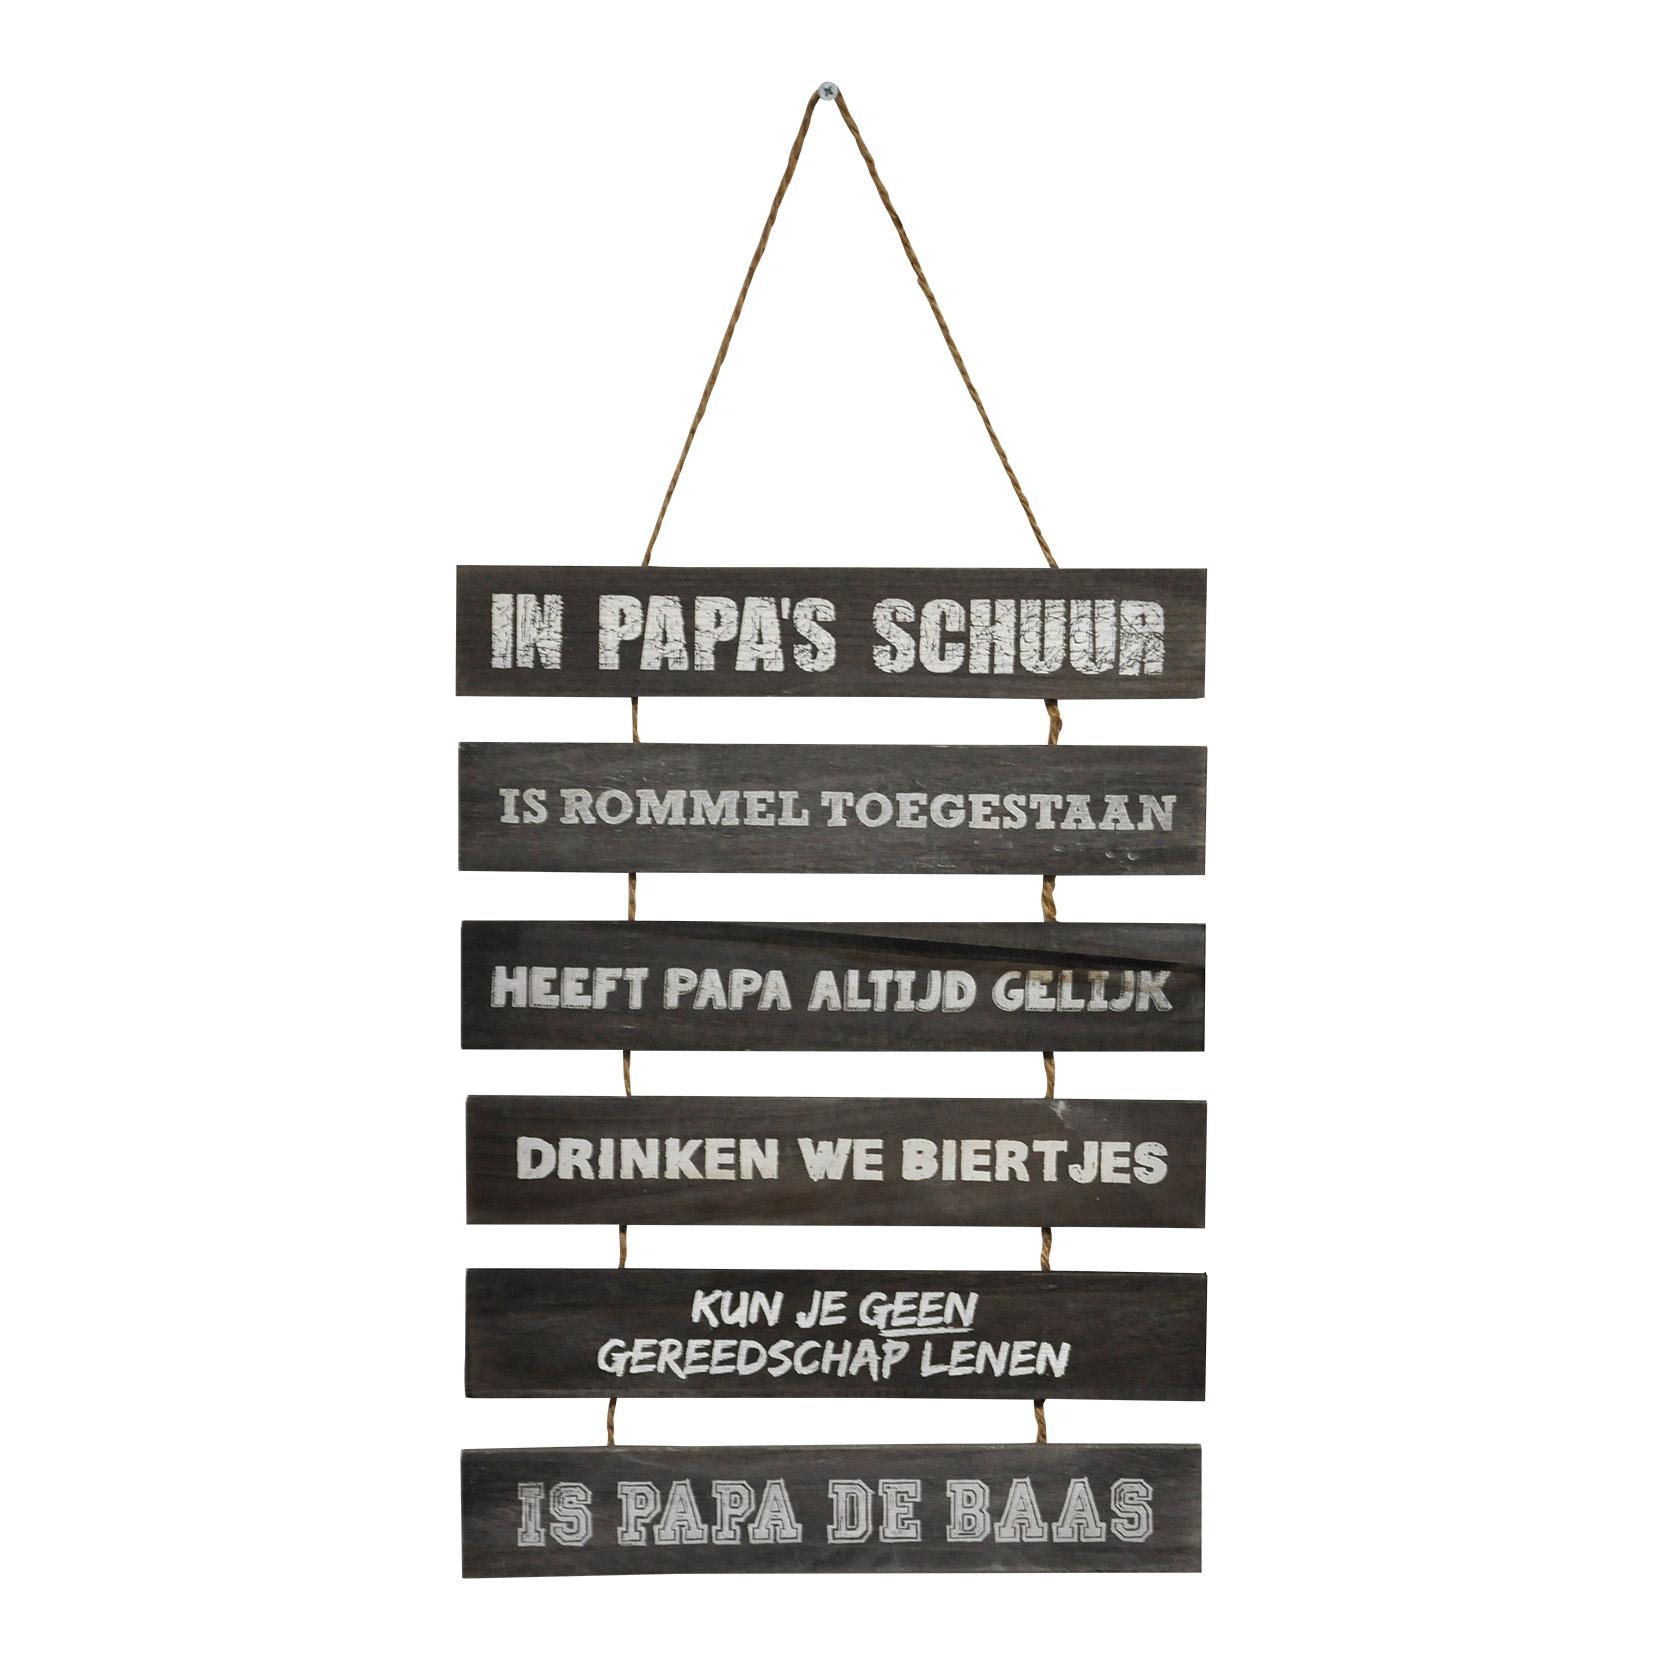 Houten bord in Papa's schuur